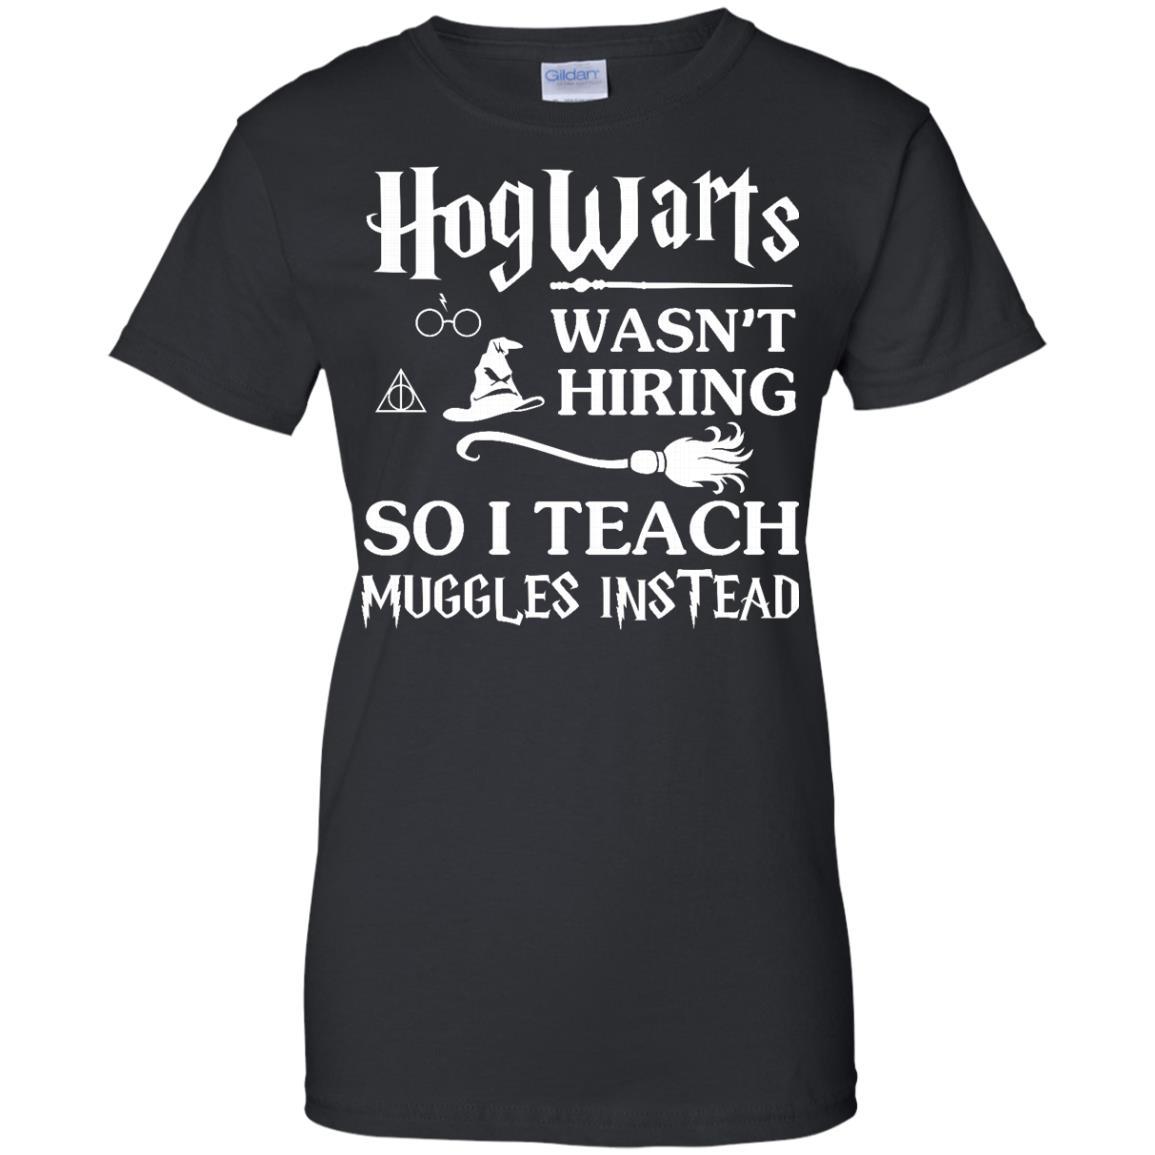 image 278px Hogwarts Wasn't Hiring So I Teach Muggles Instead T Shirts, Hoodies, Tank Top